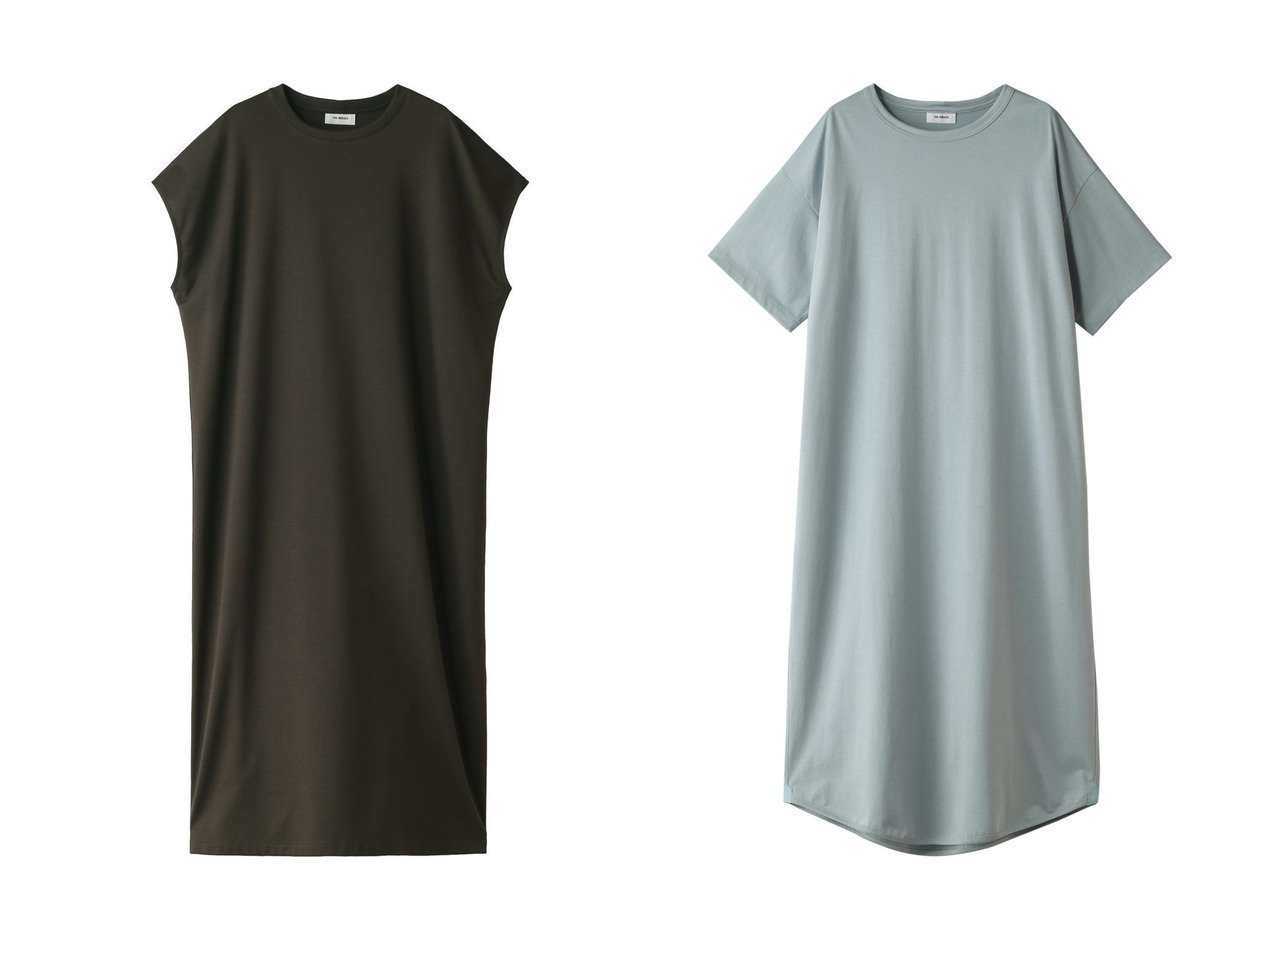 【THE RERACS/ザ リラクス】のスリーブレスドレス&ハーフスリーブベーシックドレス ワンピース・ドレスのおすすめ!人気、トレンド・レディースファッションの通販 おすすめで人気の流行・トレンド、ファッションの通販商品 メンズファッション・キッズファッション・インテリア・家具・レディースファッション・服の通販 founy(ファニー) https://founy.com/ ファッション Fashion レディースファッション WOMEN ワンピース Dress ドレス Party Dresses 2021年 2021 2021 春夏 S/S SS Spring/Summer 2021 S/S 春夏 SS Spring/Summer ショルダー シンプル ドロップ ロング 春 Spring |ID:crp329100000015049